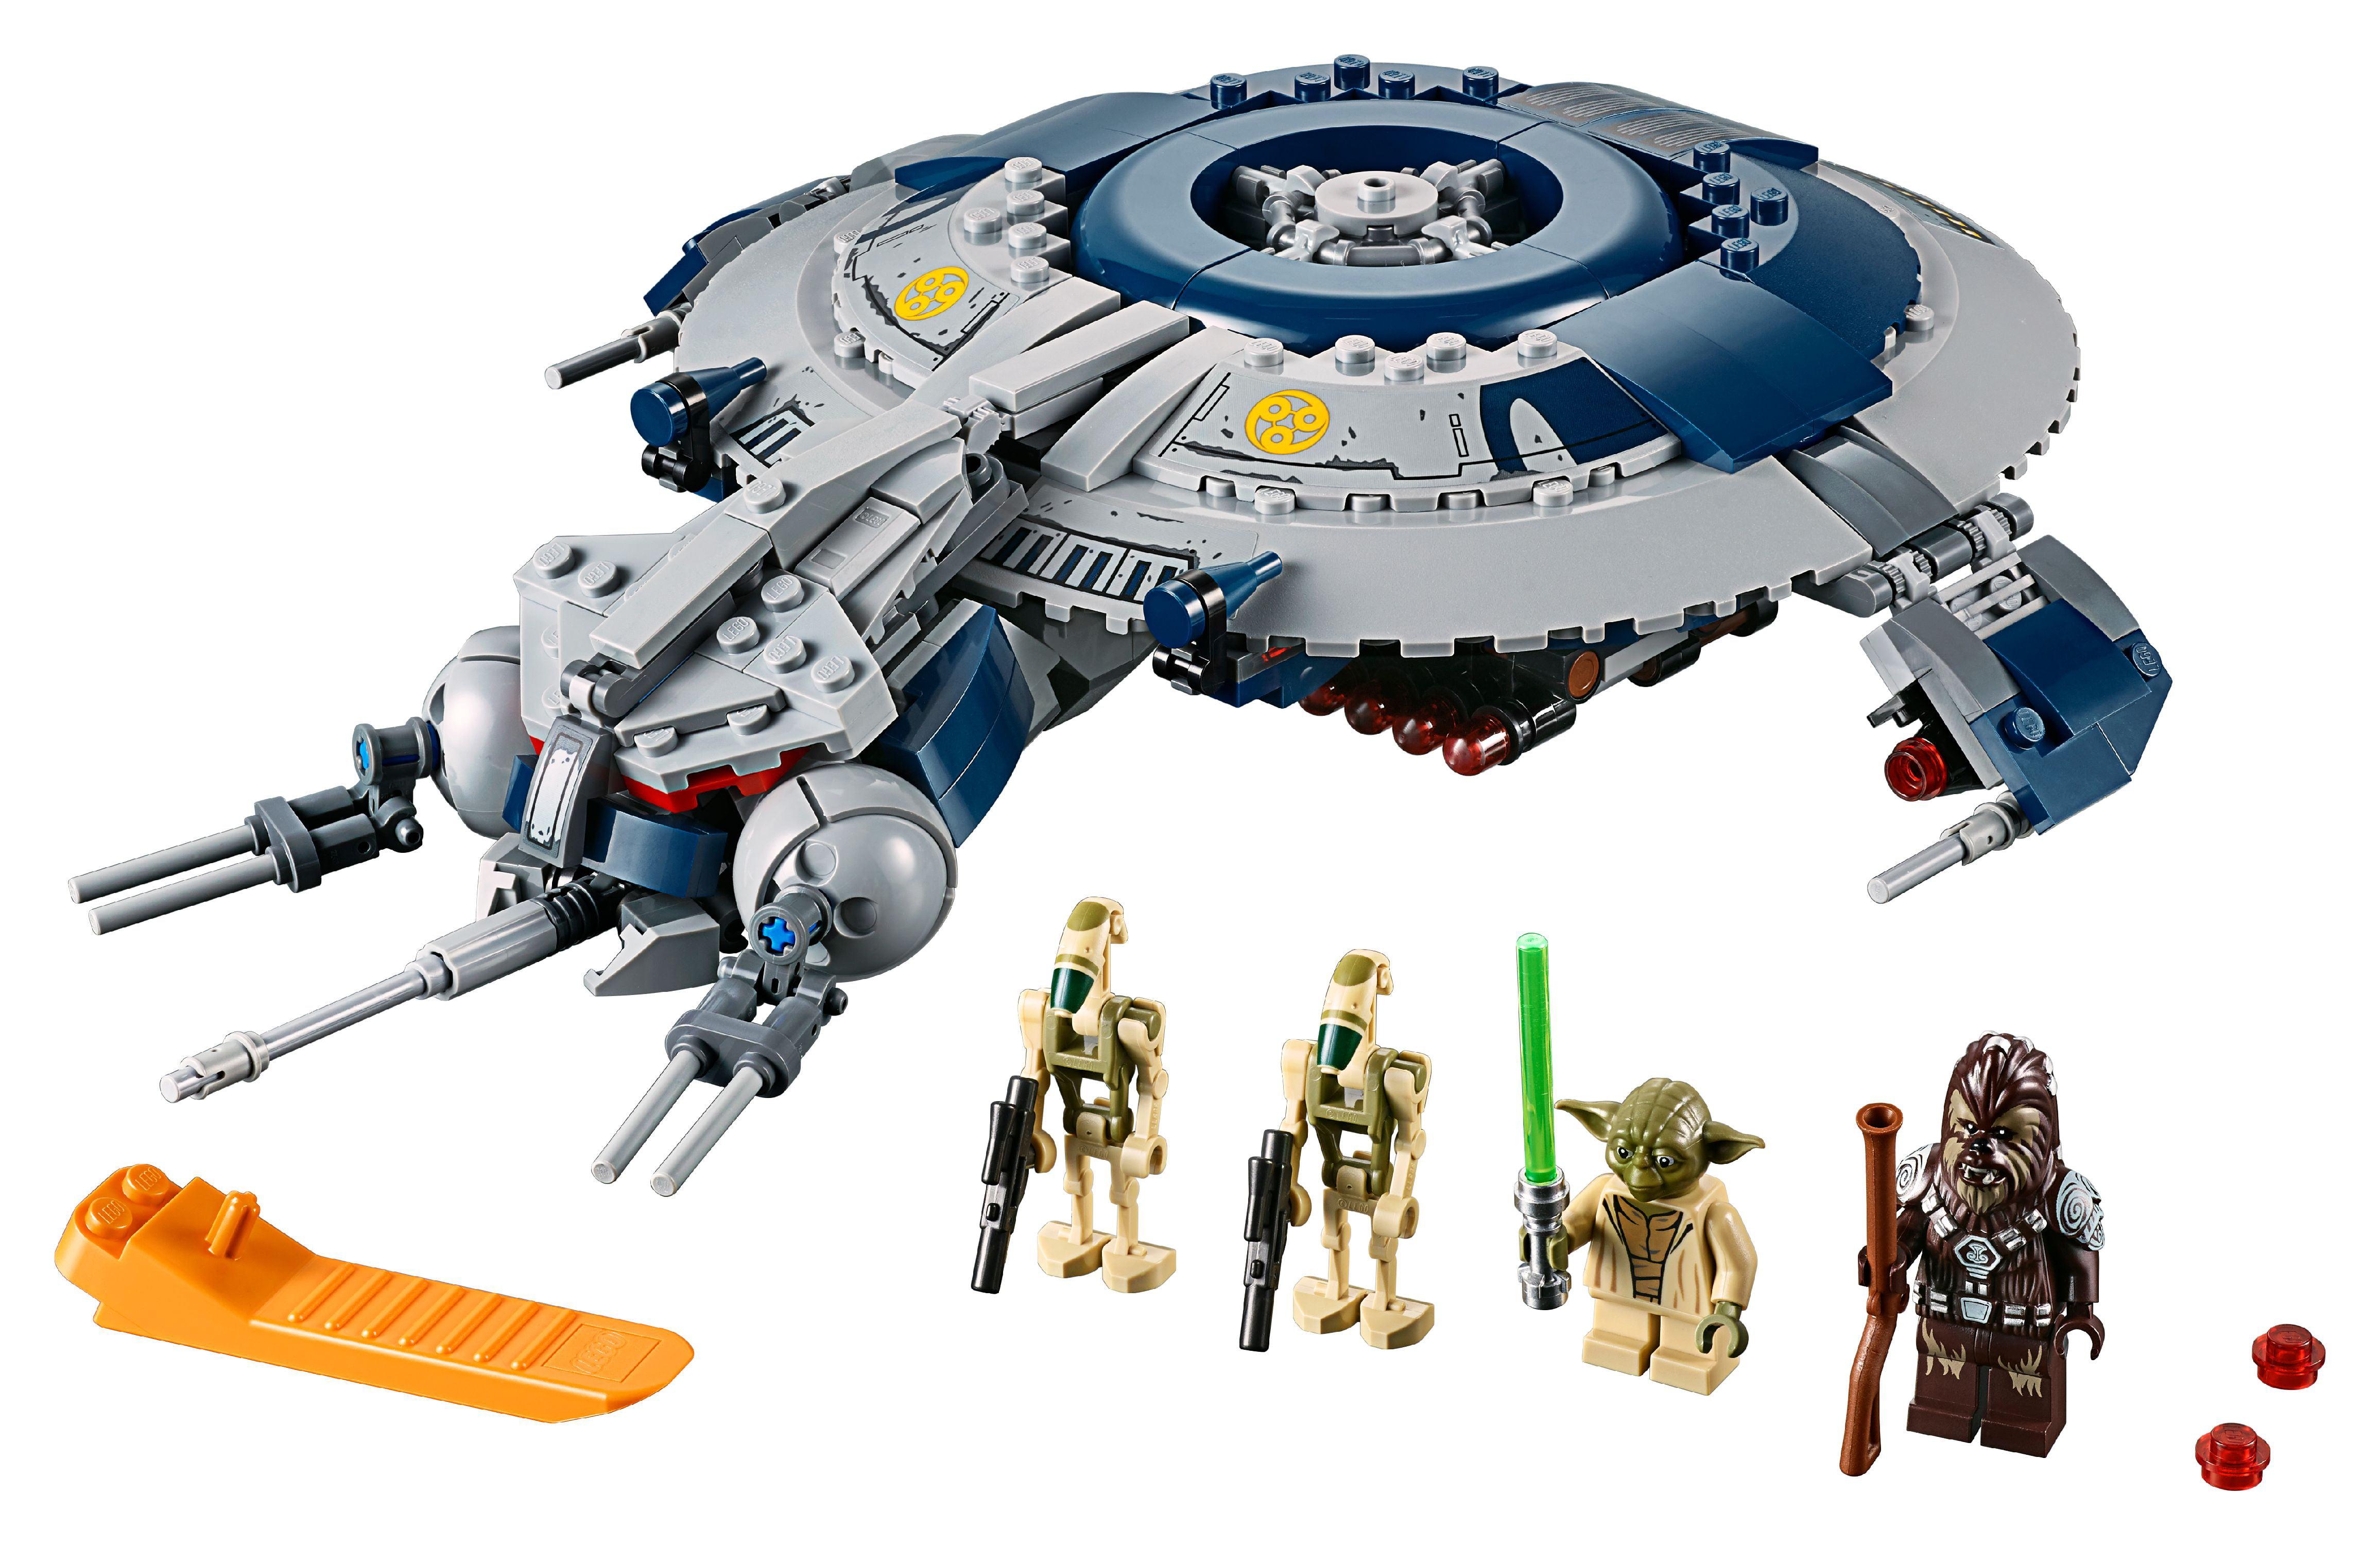 100 Pcs Hot Minifigures Battle DROID Characters Full 5 Color Star War Custom MOC